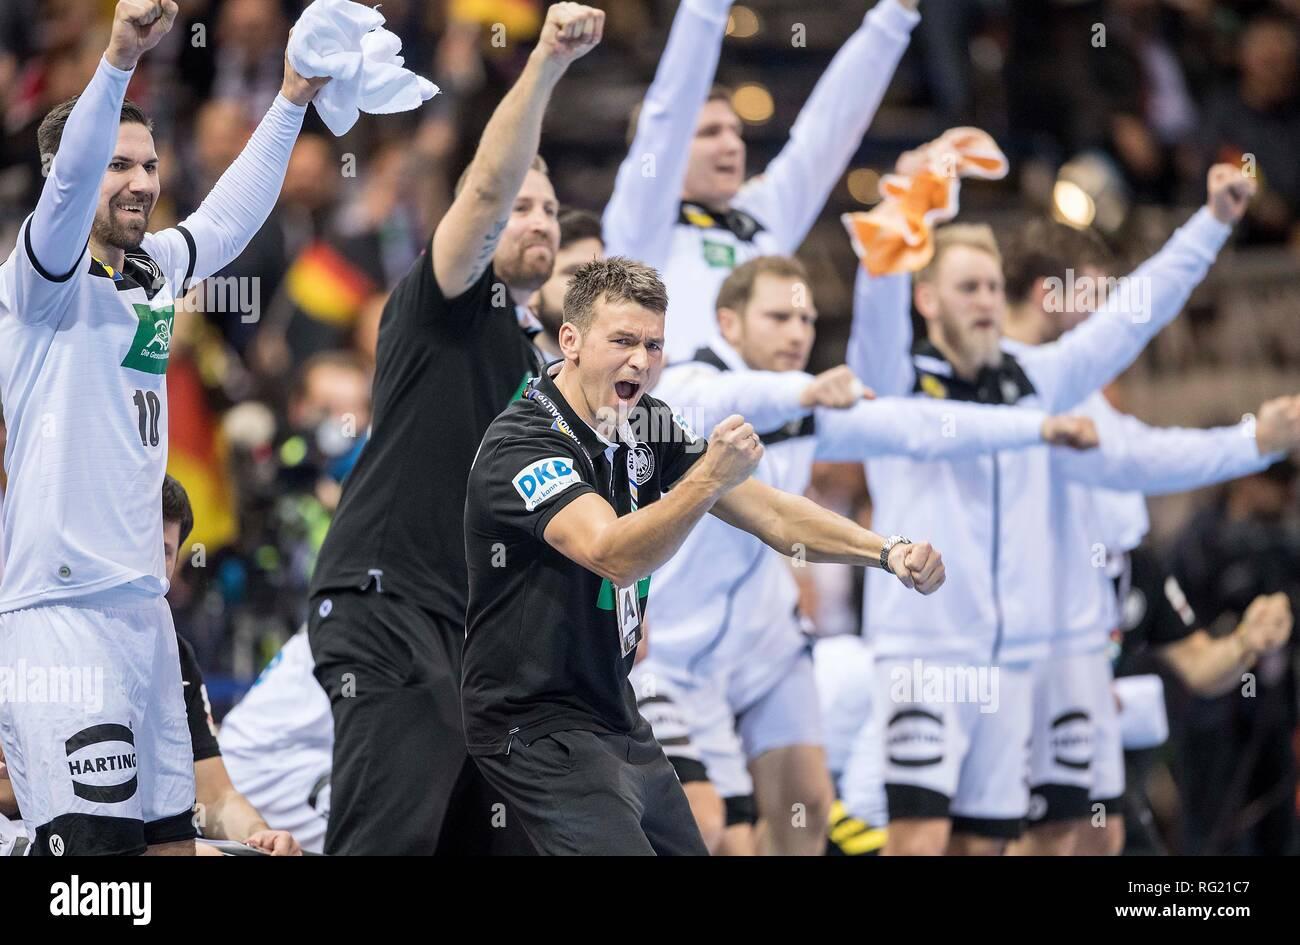 Hamburg, Deutschland. 25th Jan, 2019. jubilation Team GER with coach Christian PROKOP (GER), semi-final Germany (GER) - Norway (NOR), on 25.01.2019 in Hamburg/Germany. Handball World Cup 2019, from 10.01. - 27.01.2019 in Germany/Denmark. | usage worldwide Credit: dpa/Alamy Live News Stock Photo